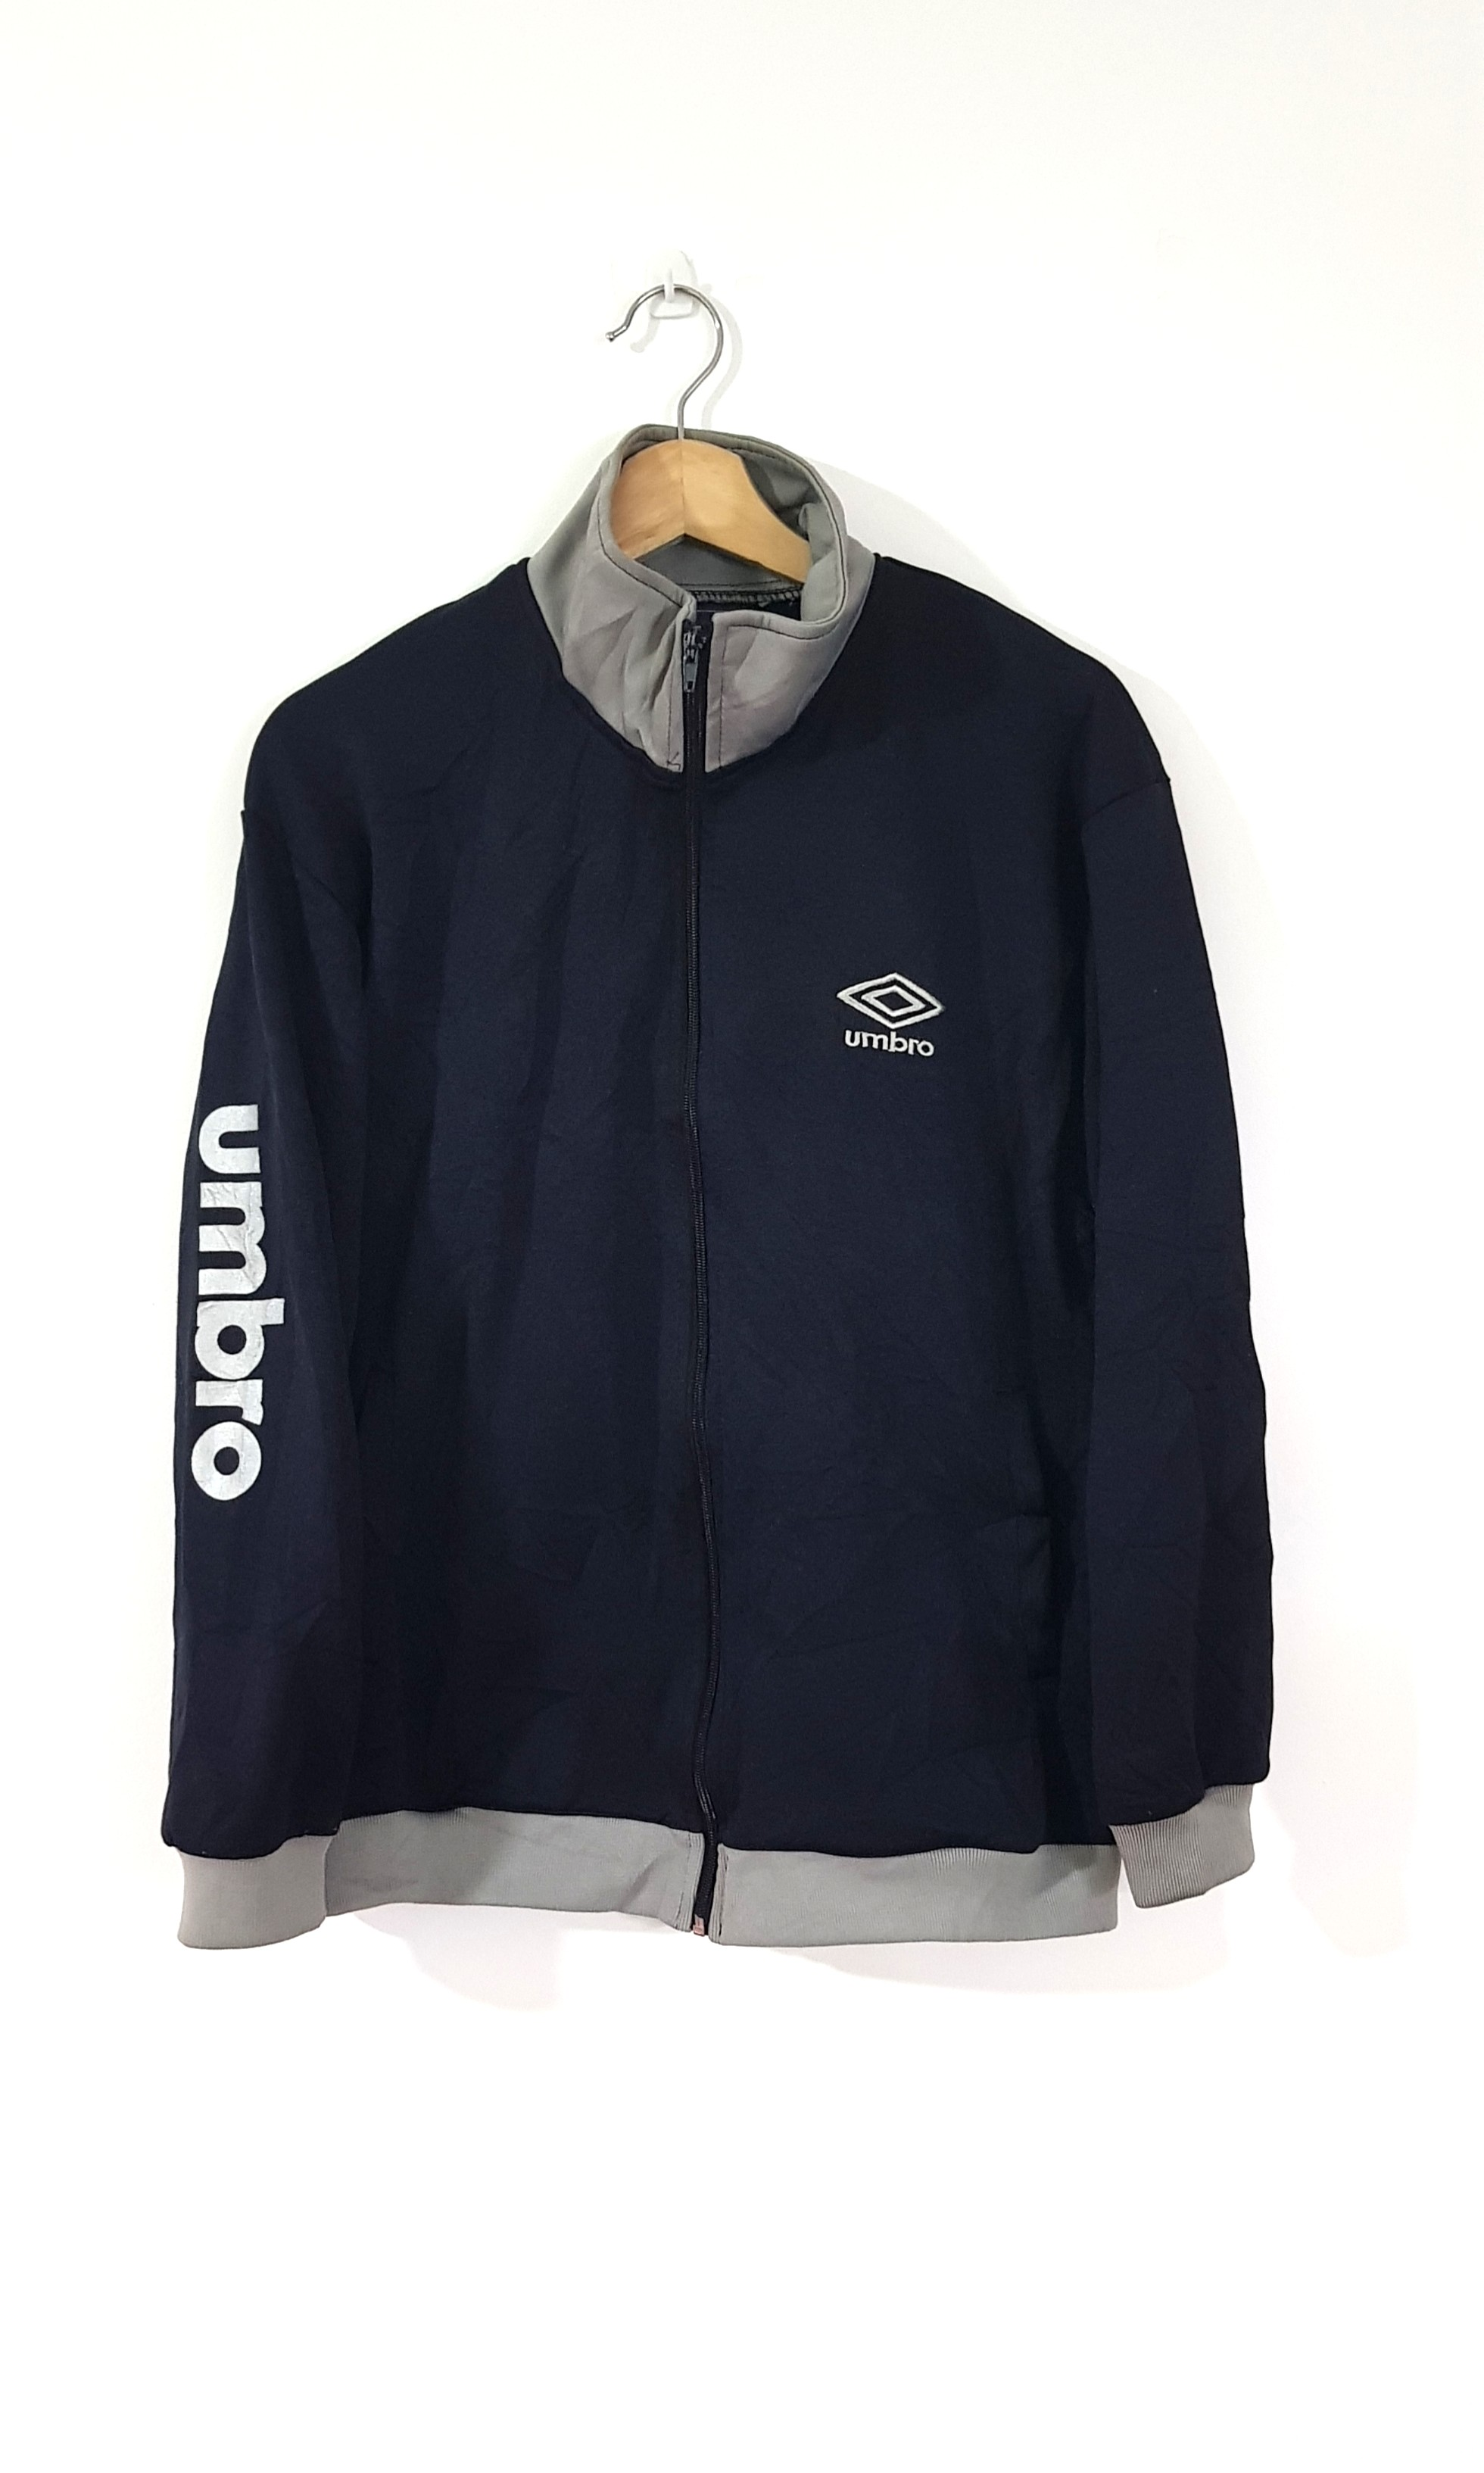 Clothes Umbro exclusive photo